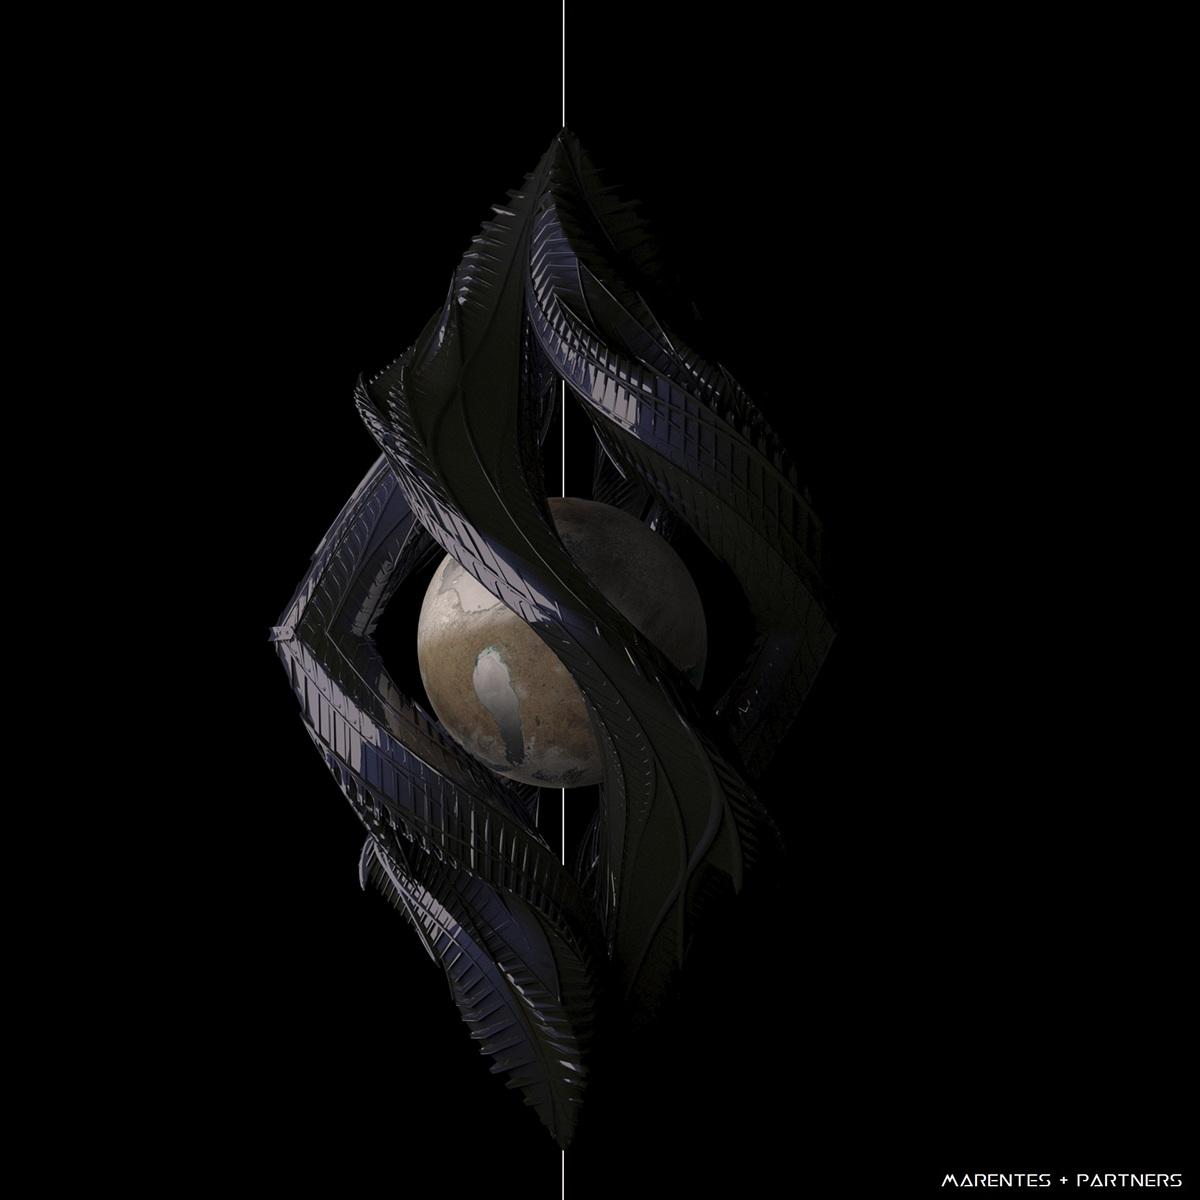 #scfi #conceptart #conceptdesign #star #death #planet #architecture #organic #invaders